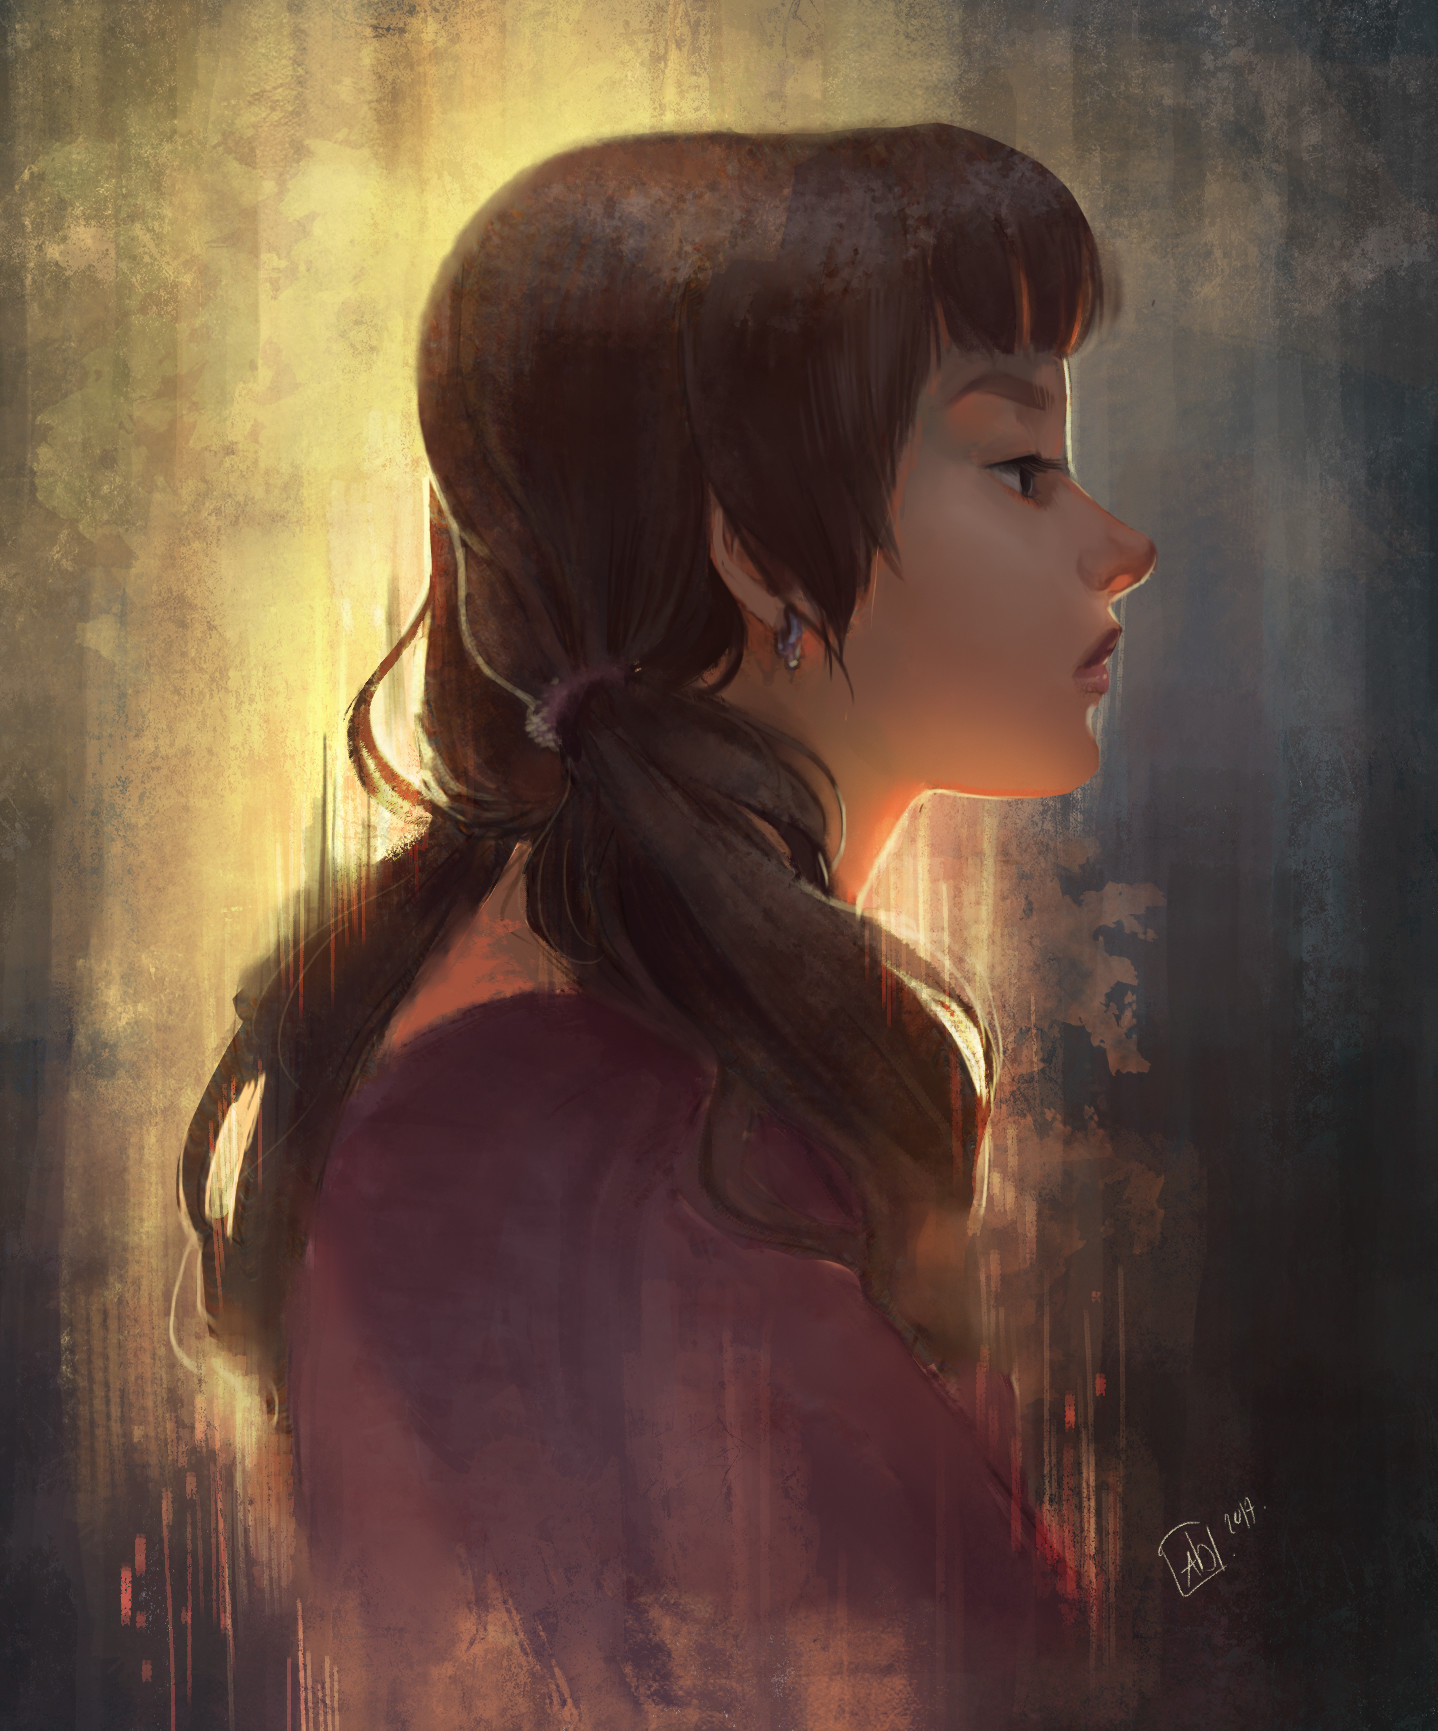 Annie doyon portrait girl 05 2017